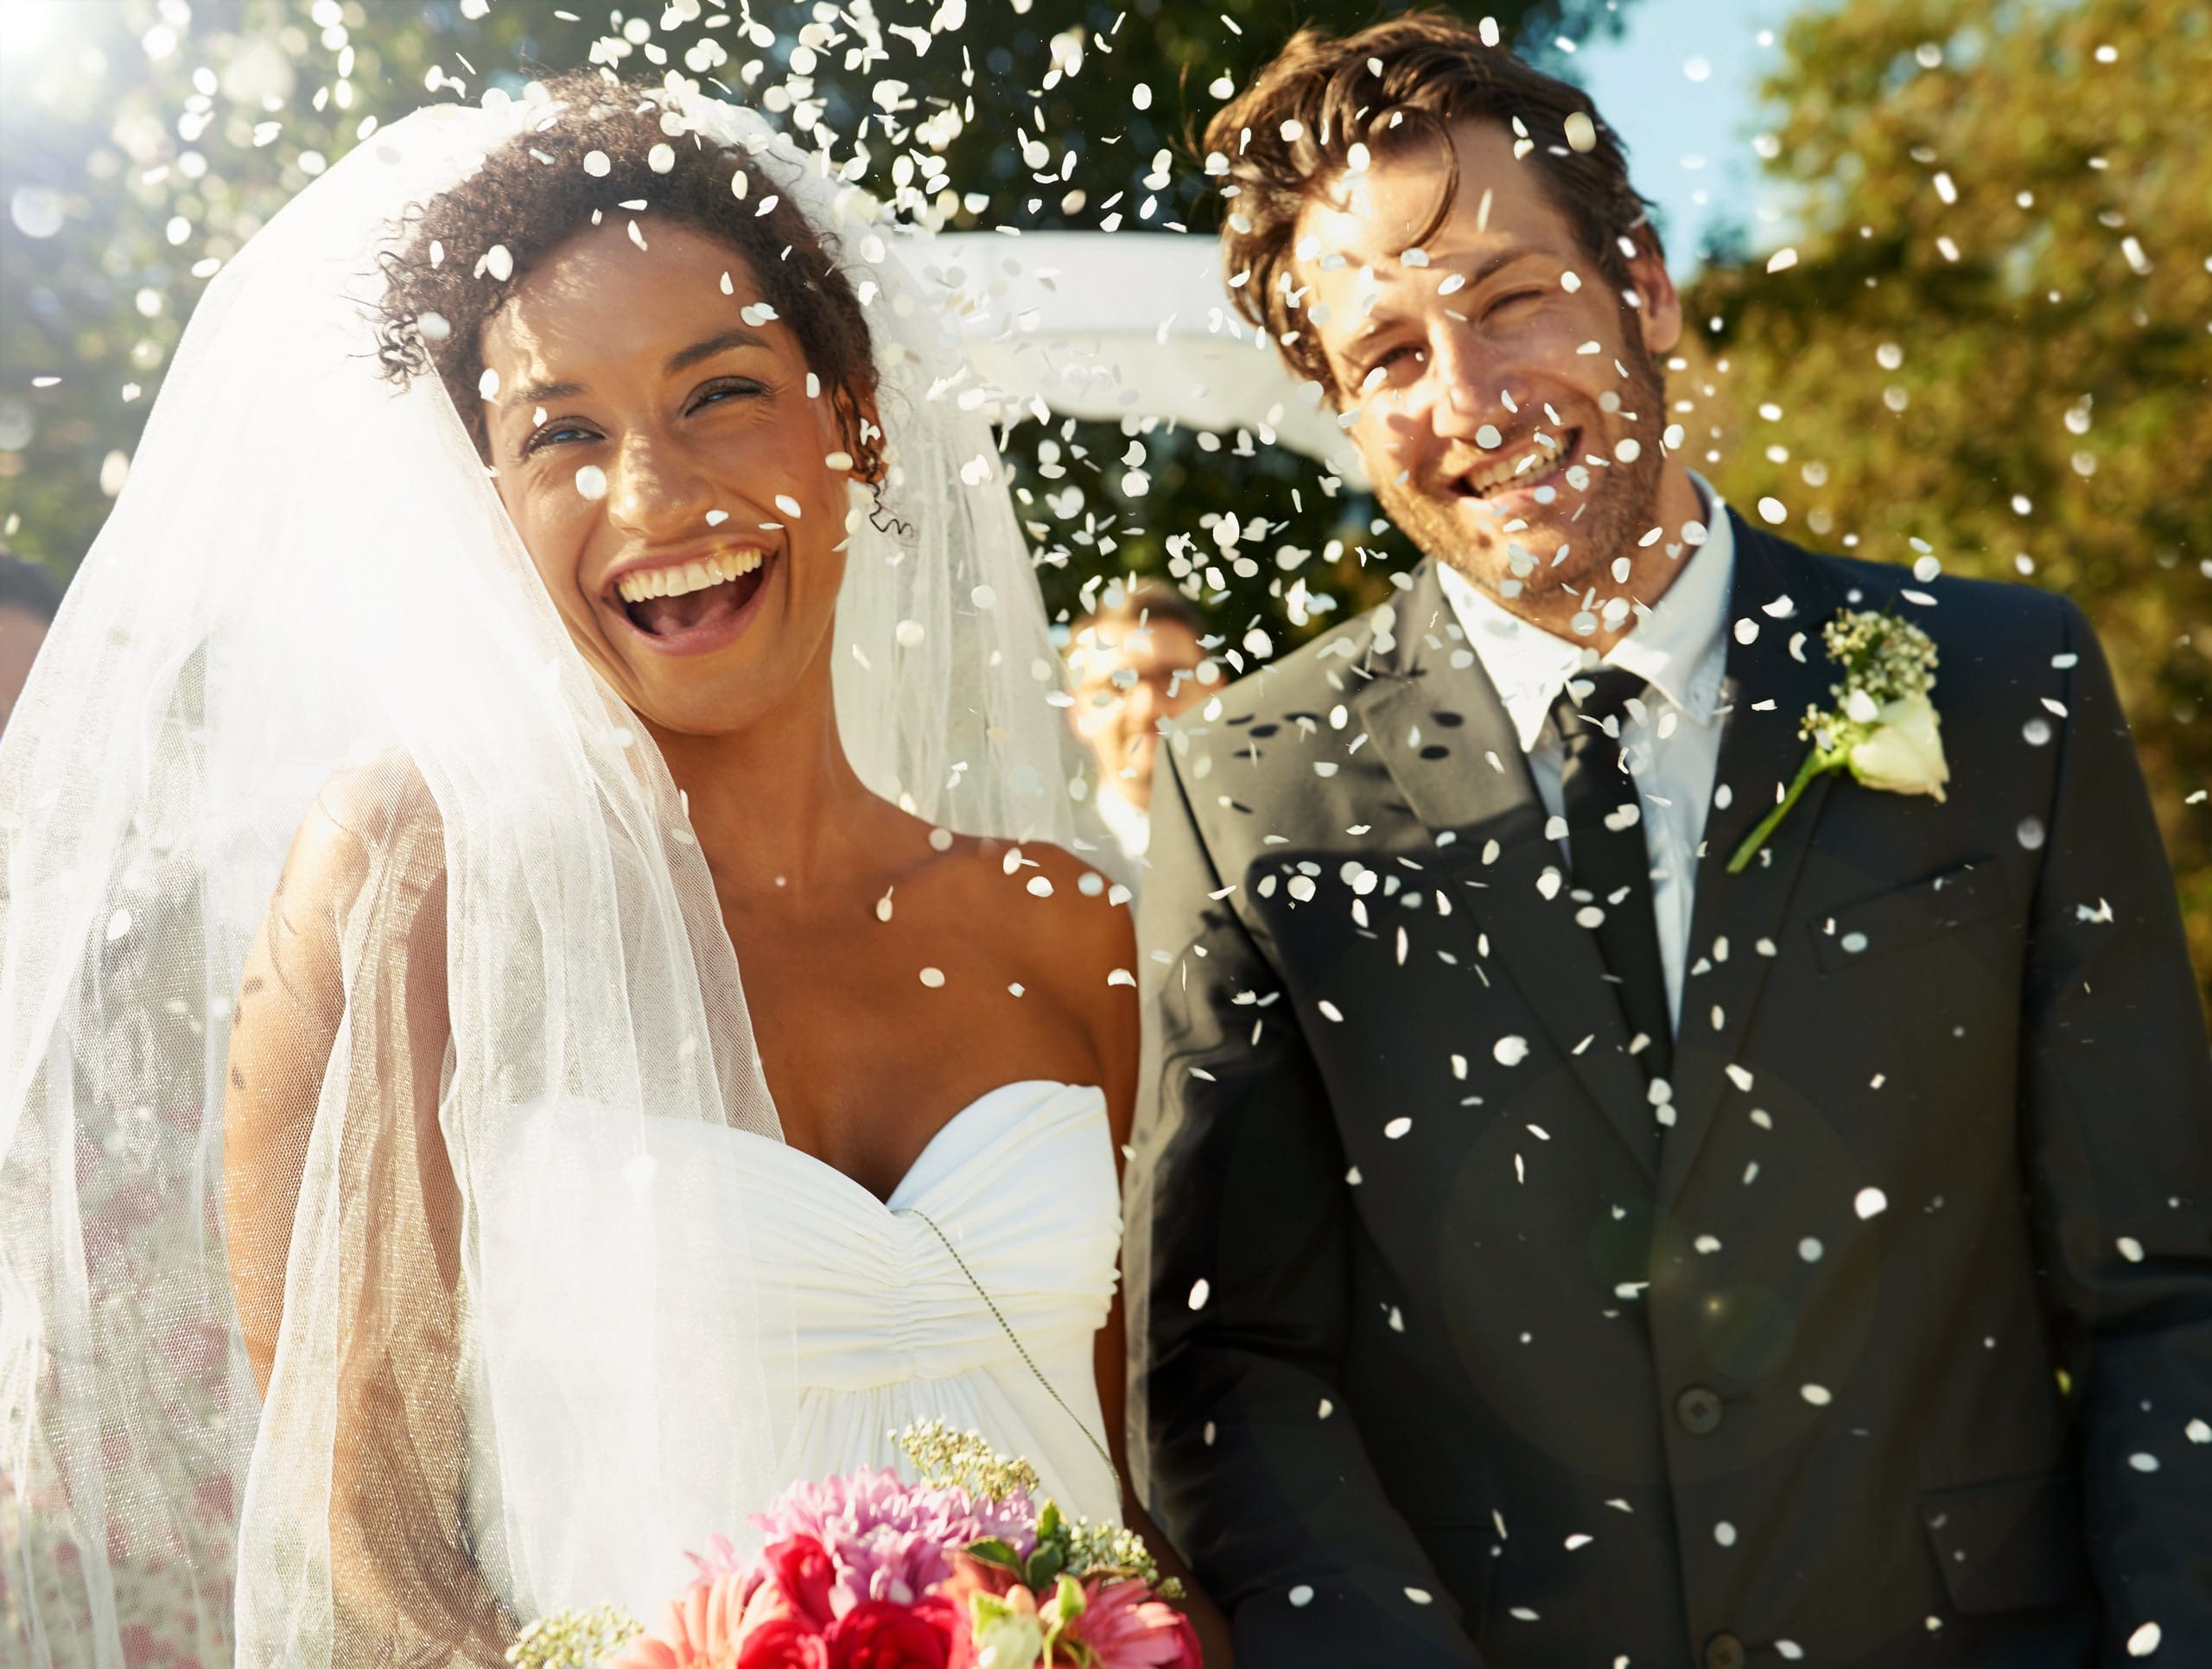 evlilik yardimi parasi ne sartlar altinda alinir